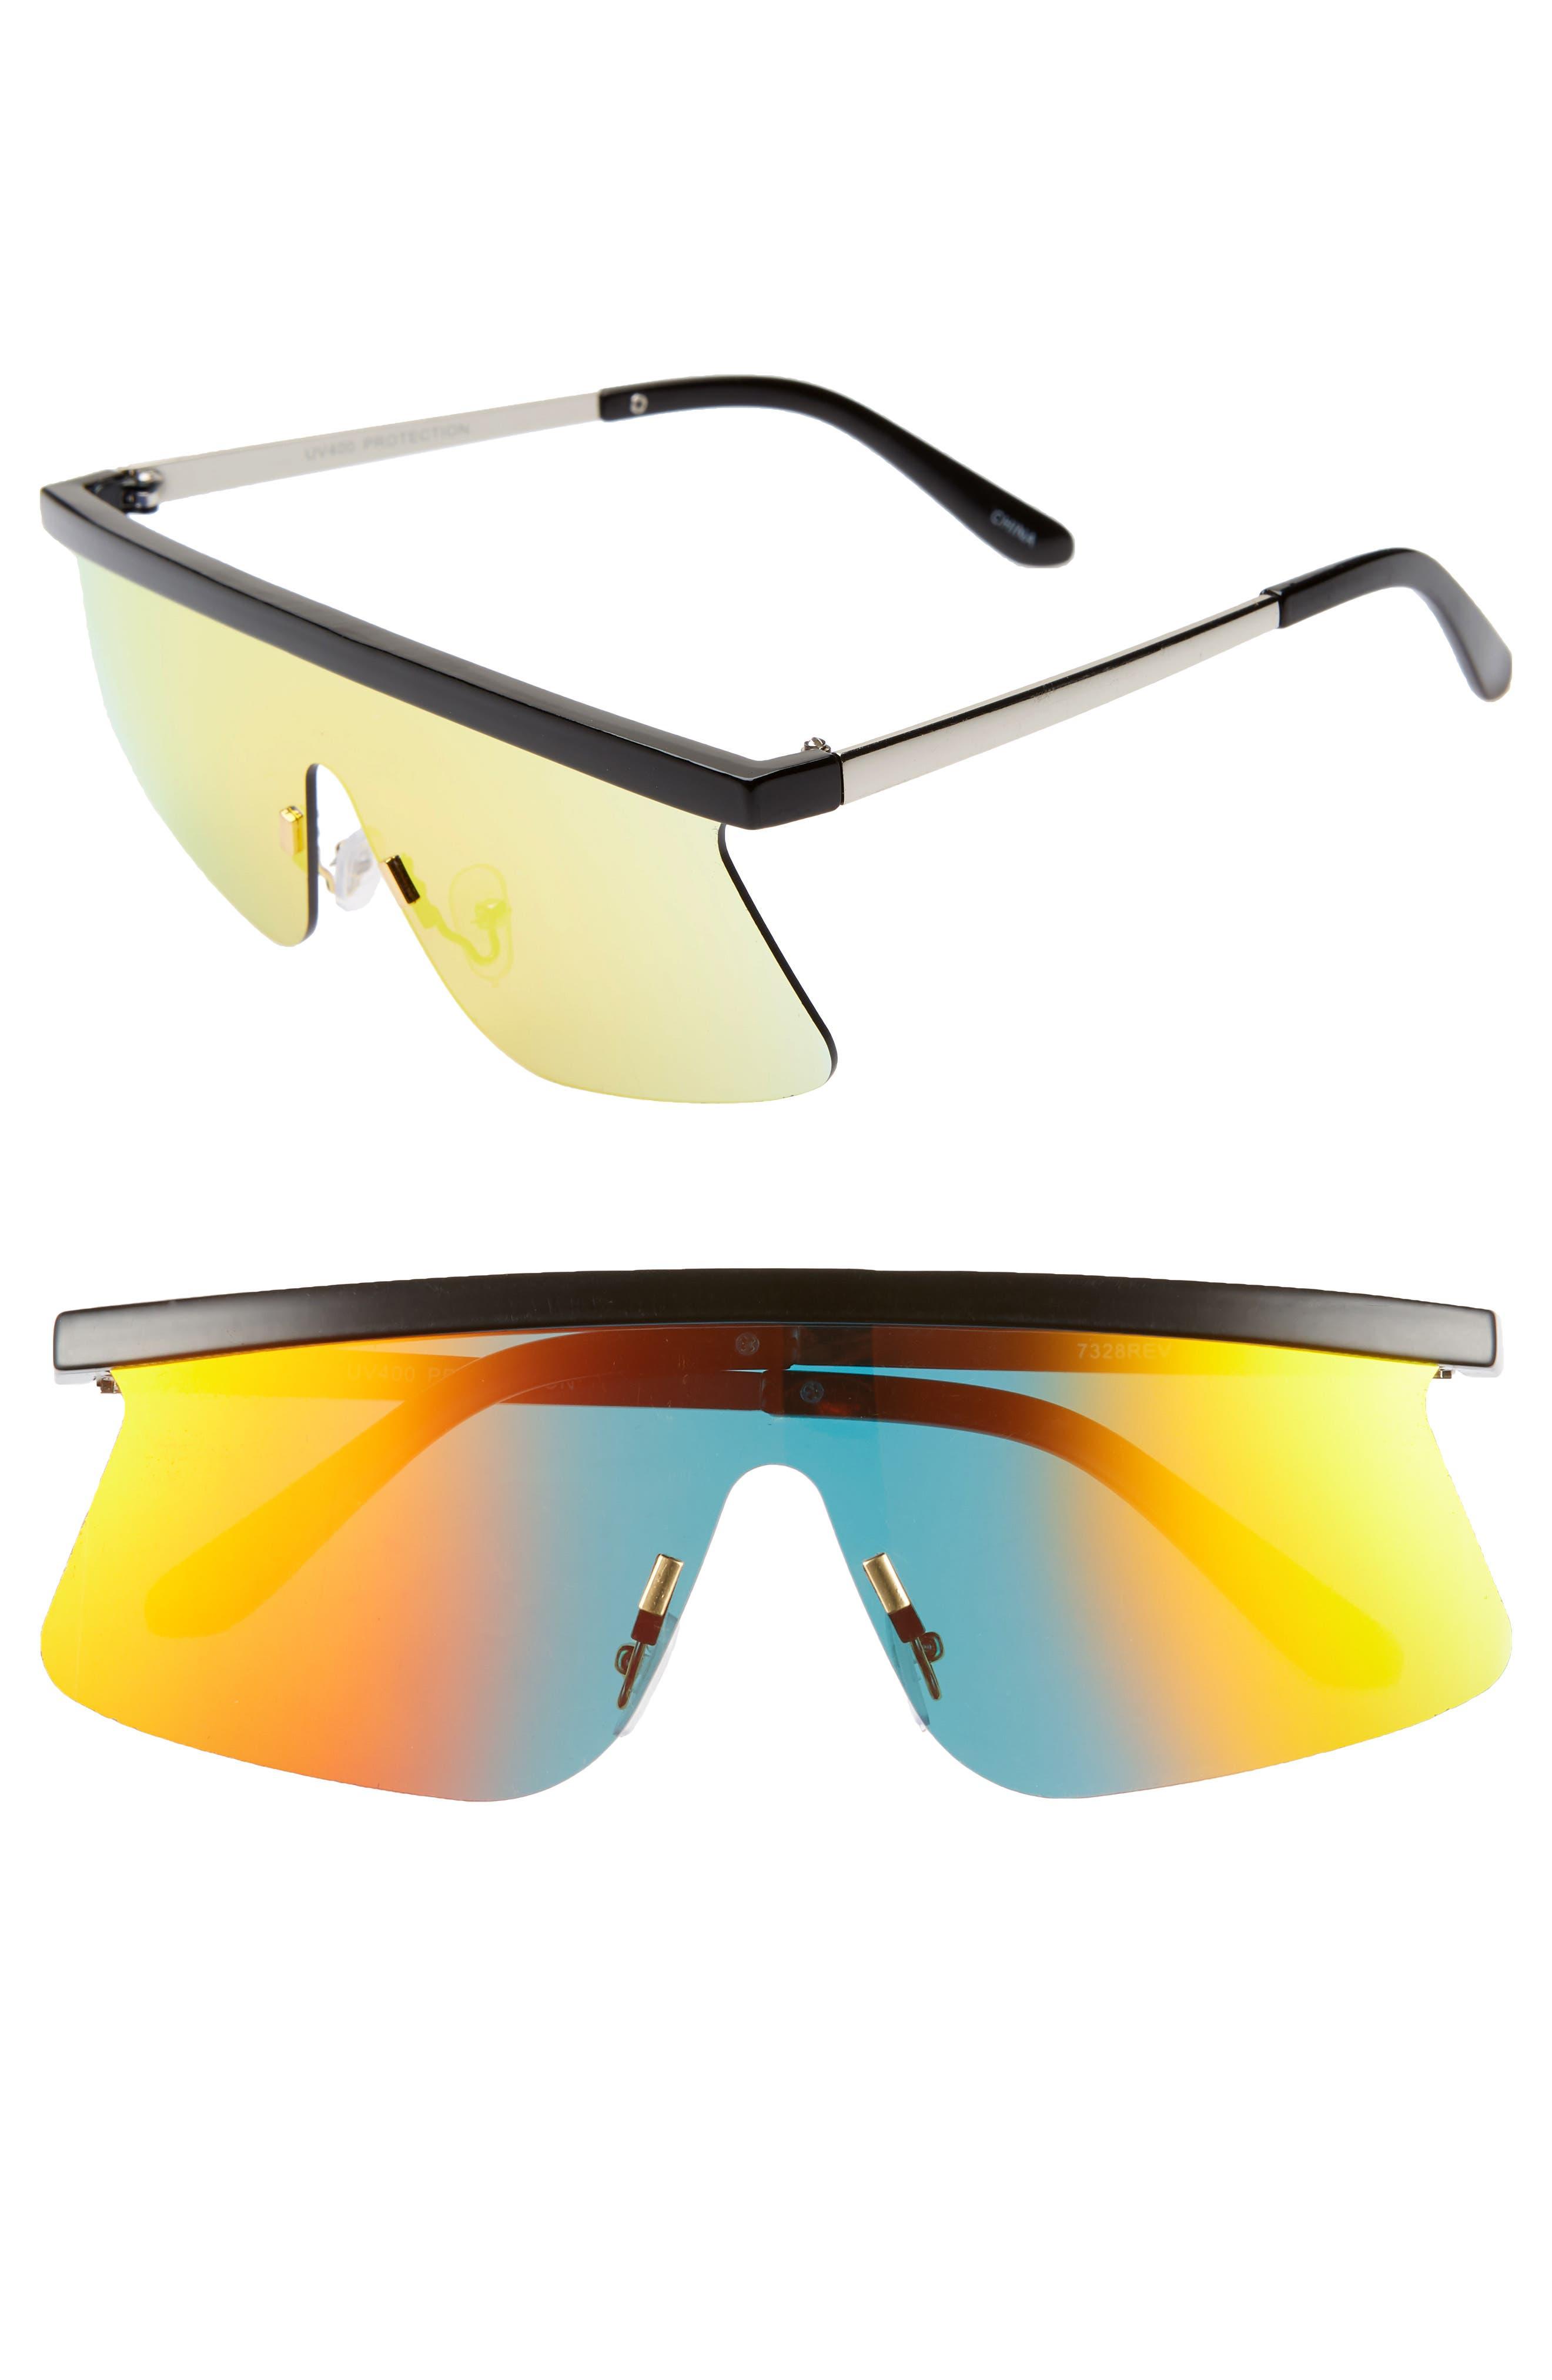 Brow Bar Shield Sunglasses,                             Main thumbnail 1, color,                             BLACK/ ORANGE